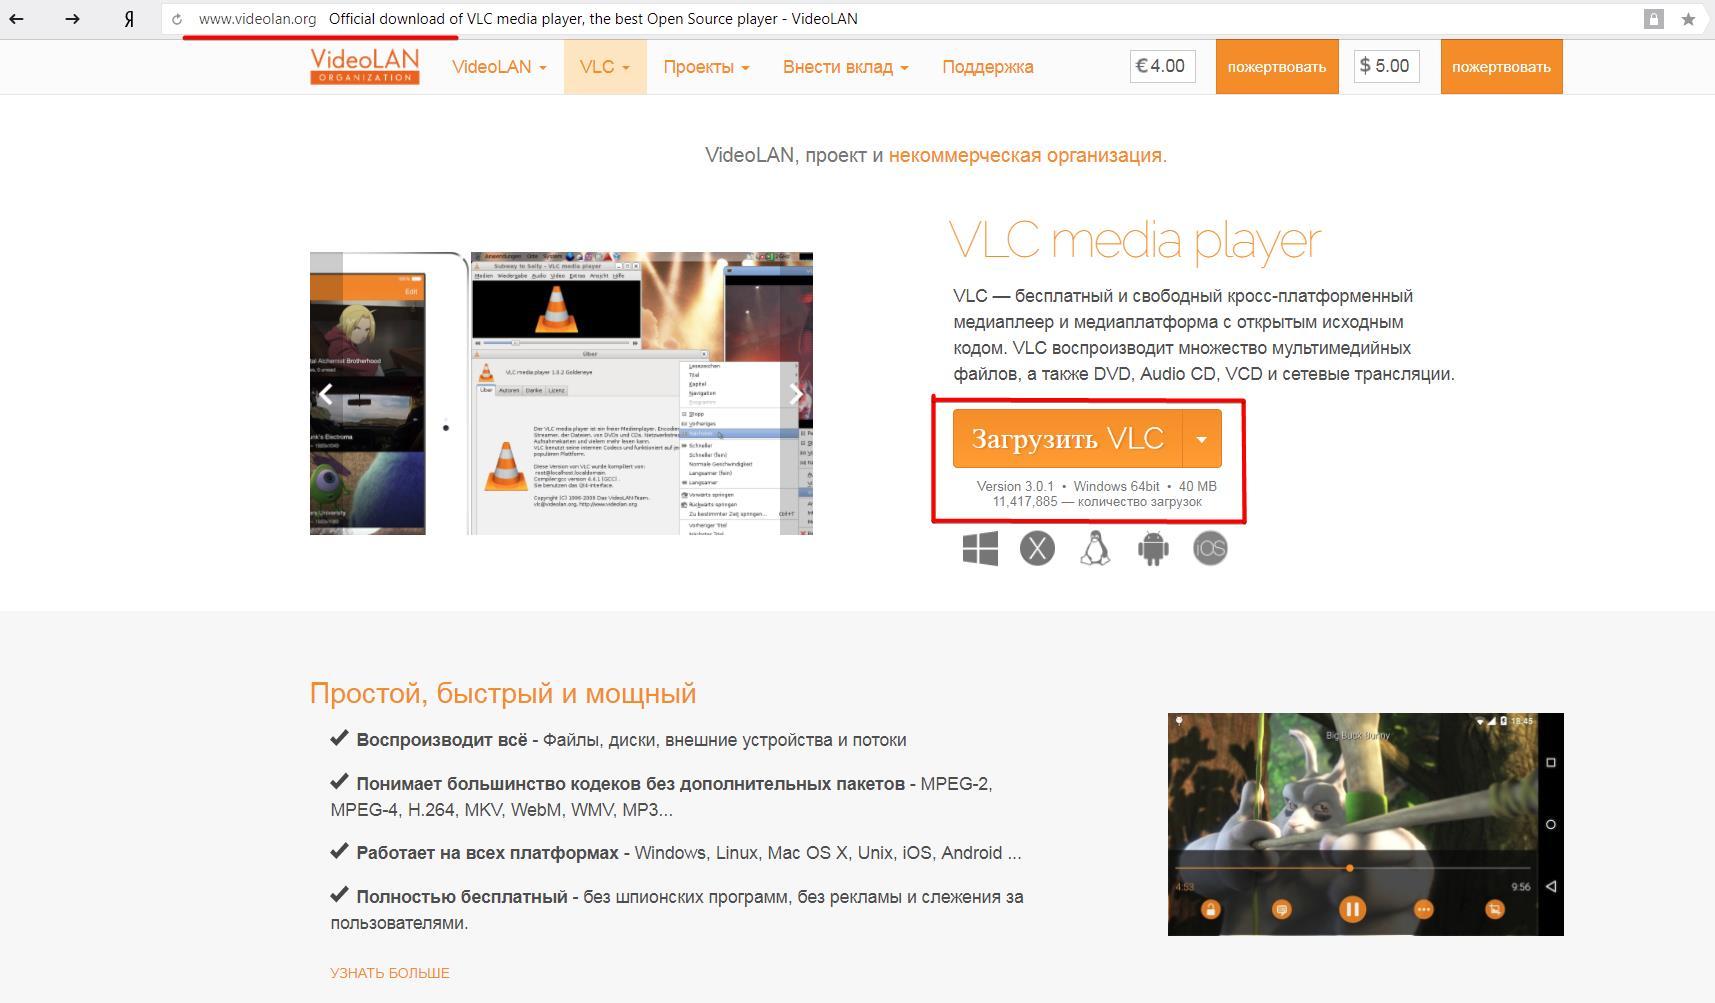 Официальный сайт VLC Player